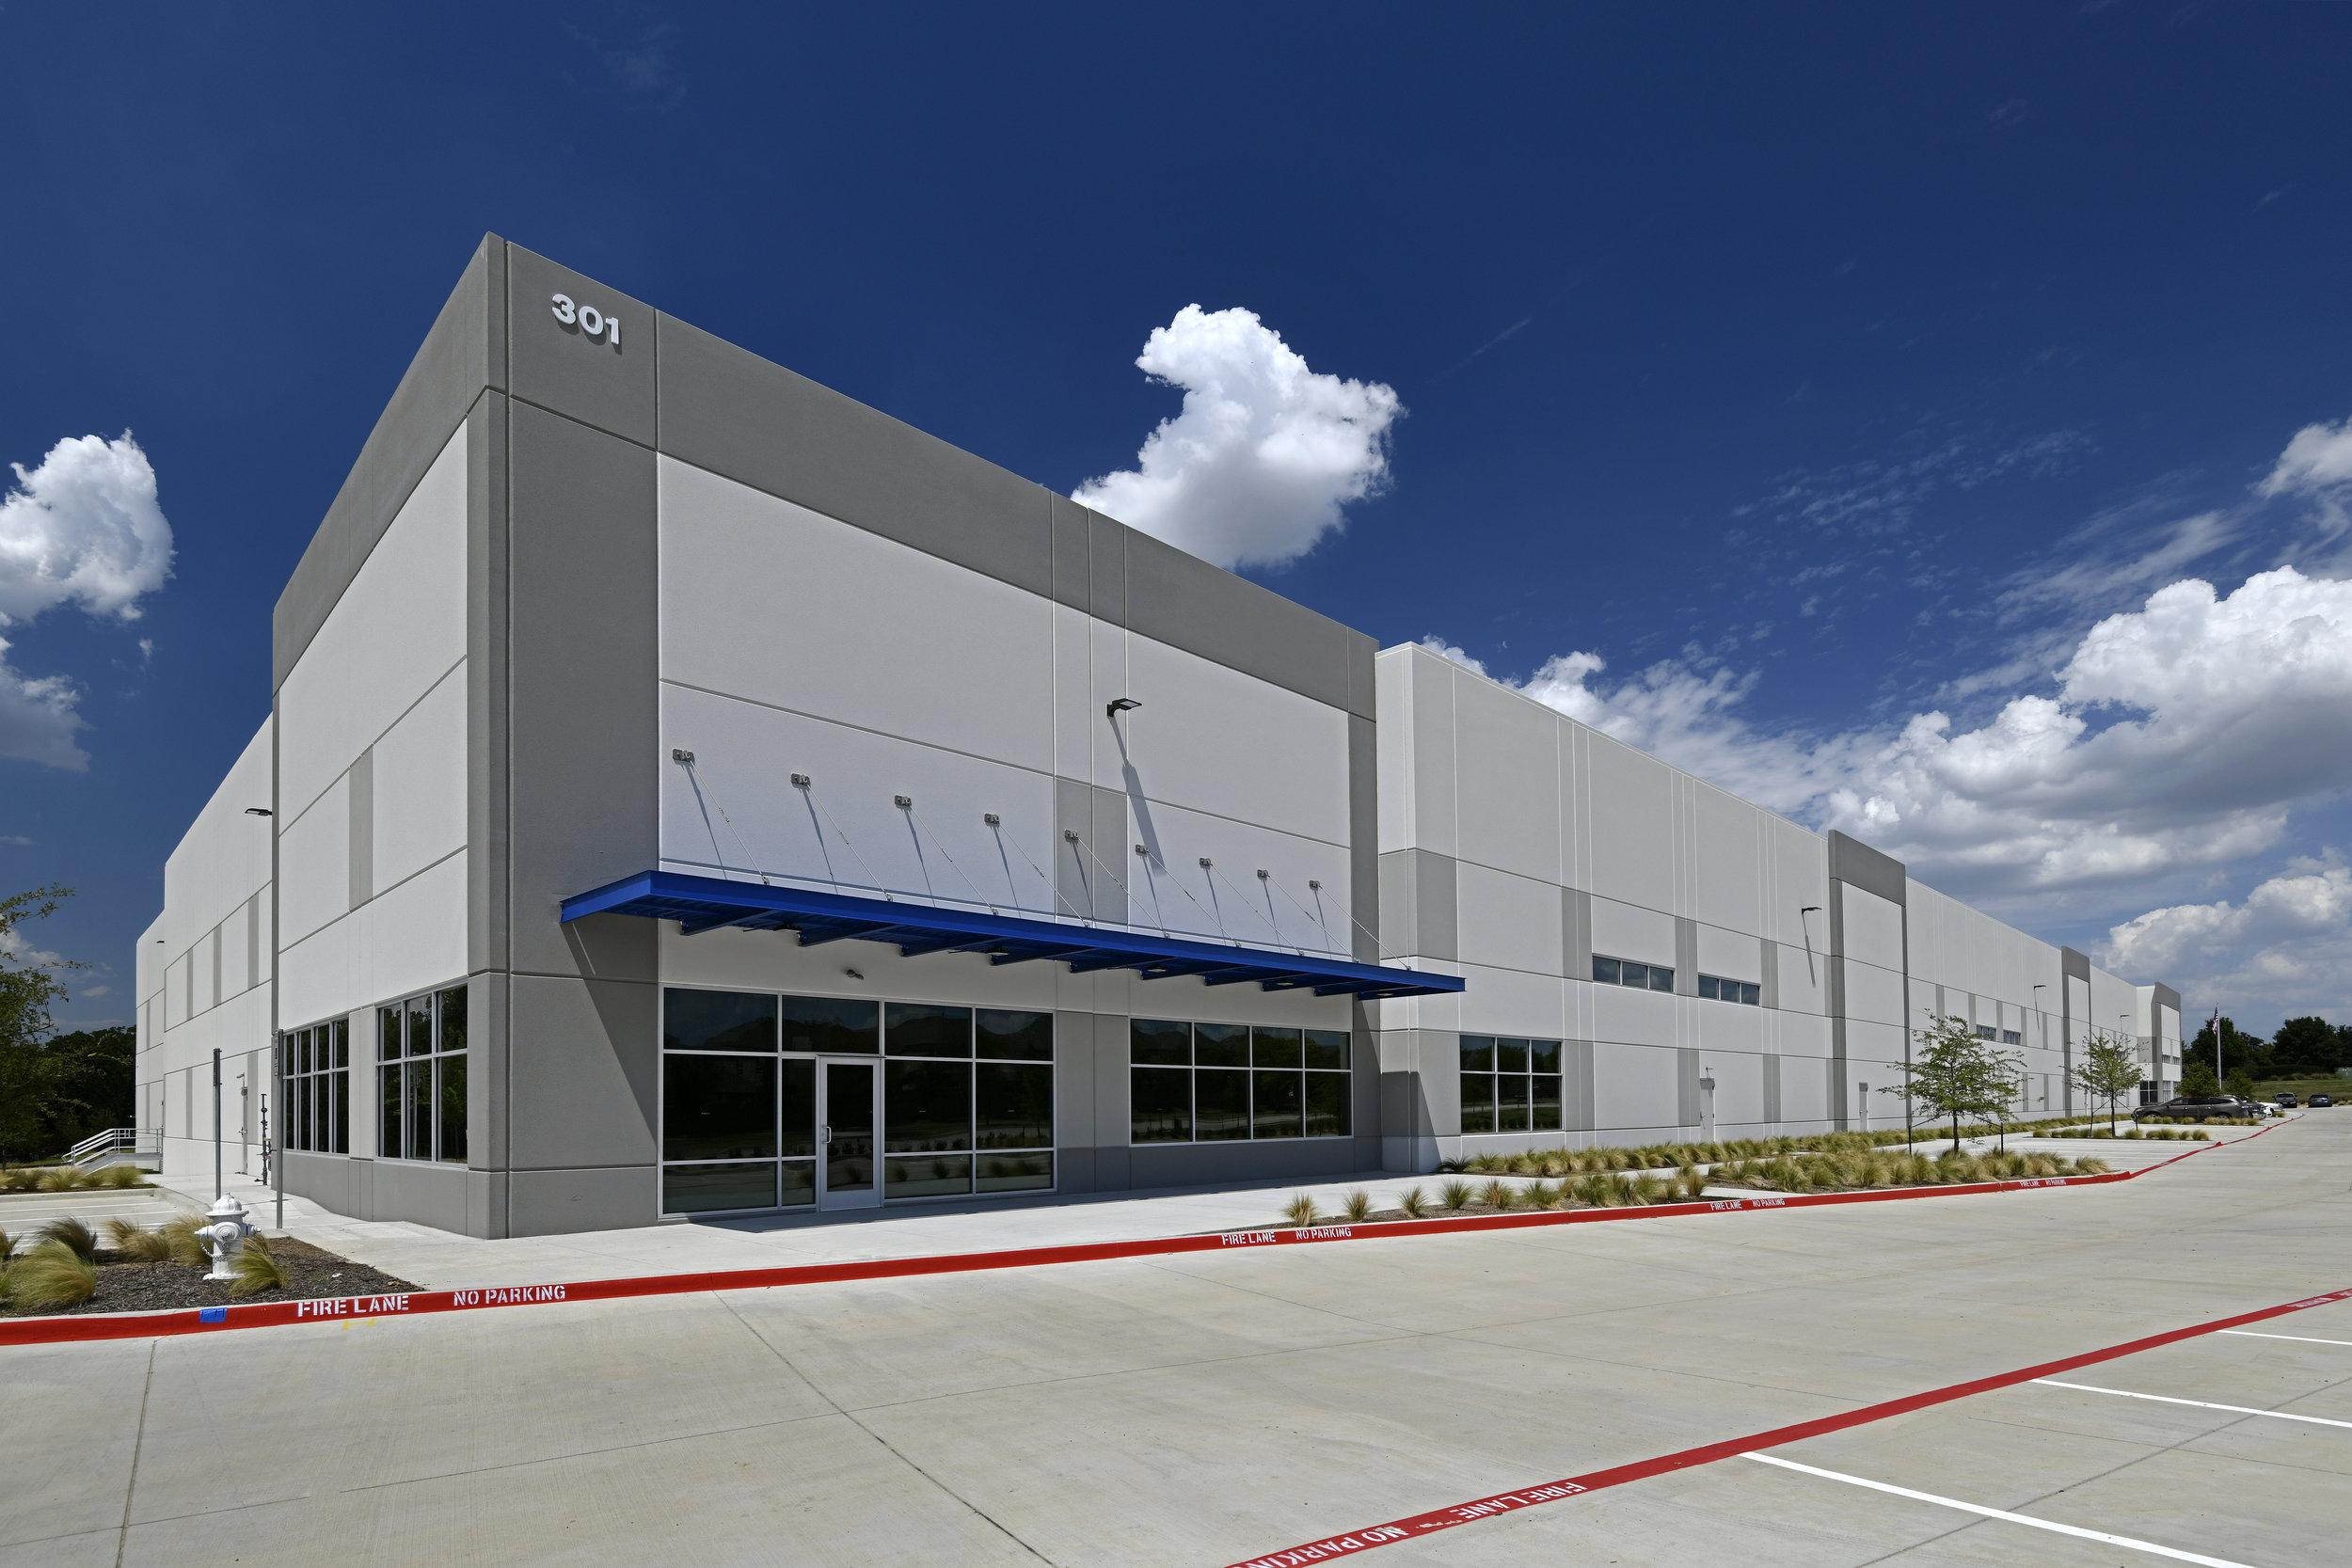 Innovative-IDM Warehouse, Lewisville, TX